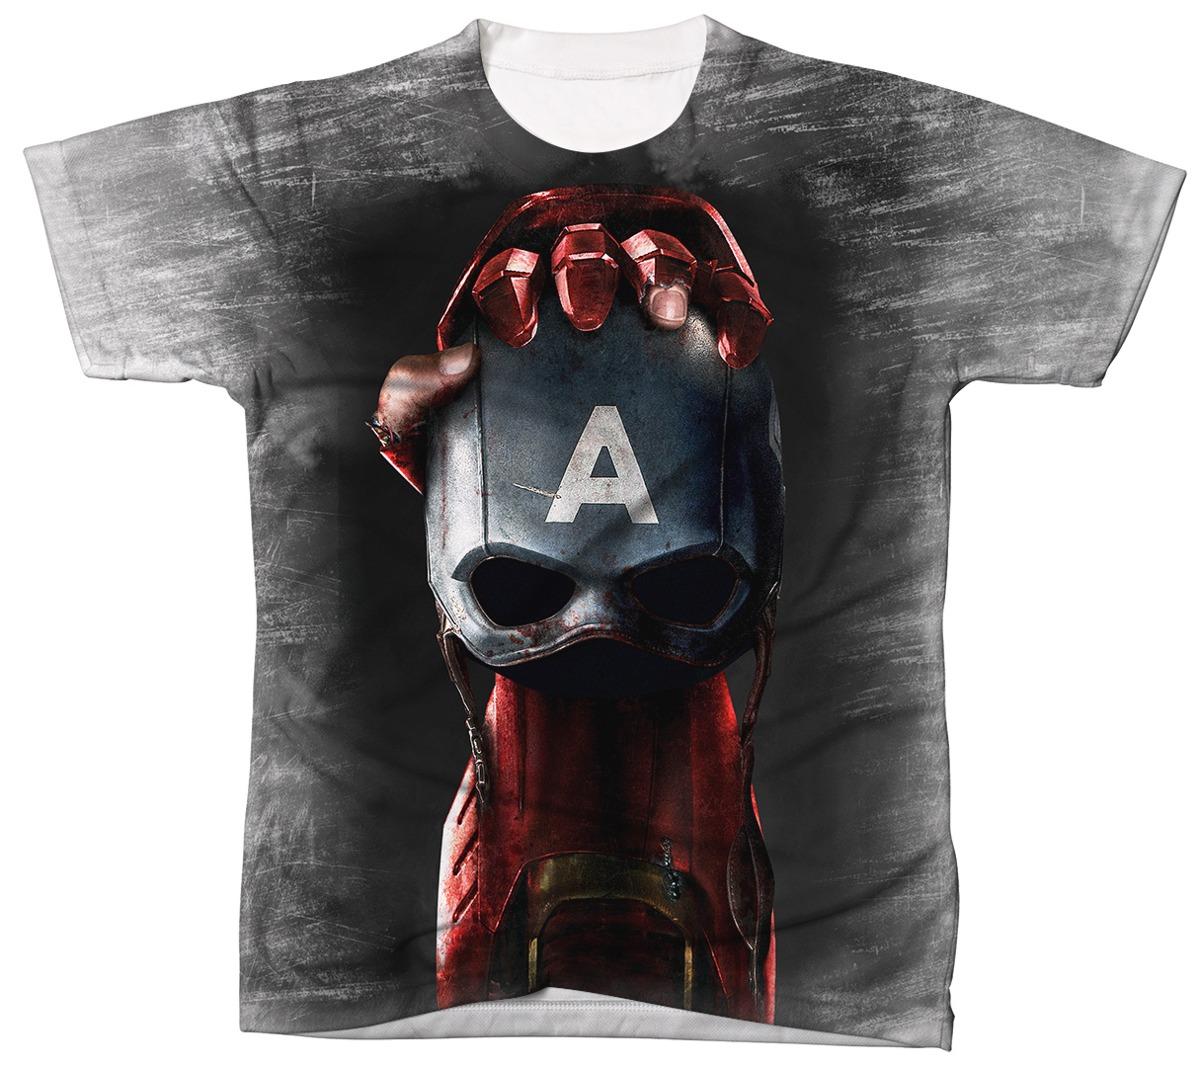 6495af8ca8 Camiseta Homem De Ferro Ref 040 Camisa Masculina - R  41